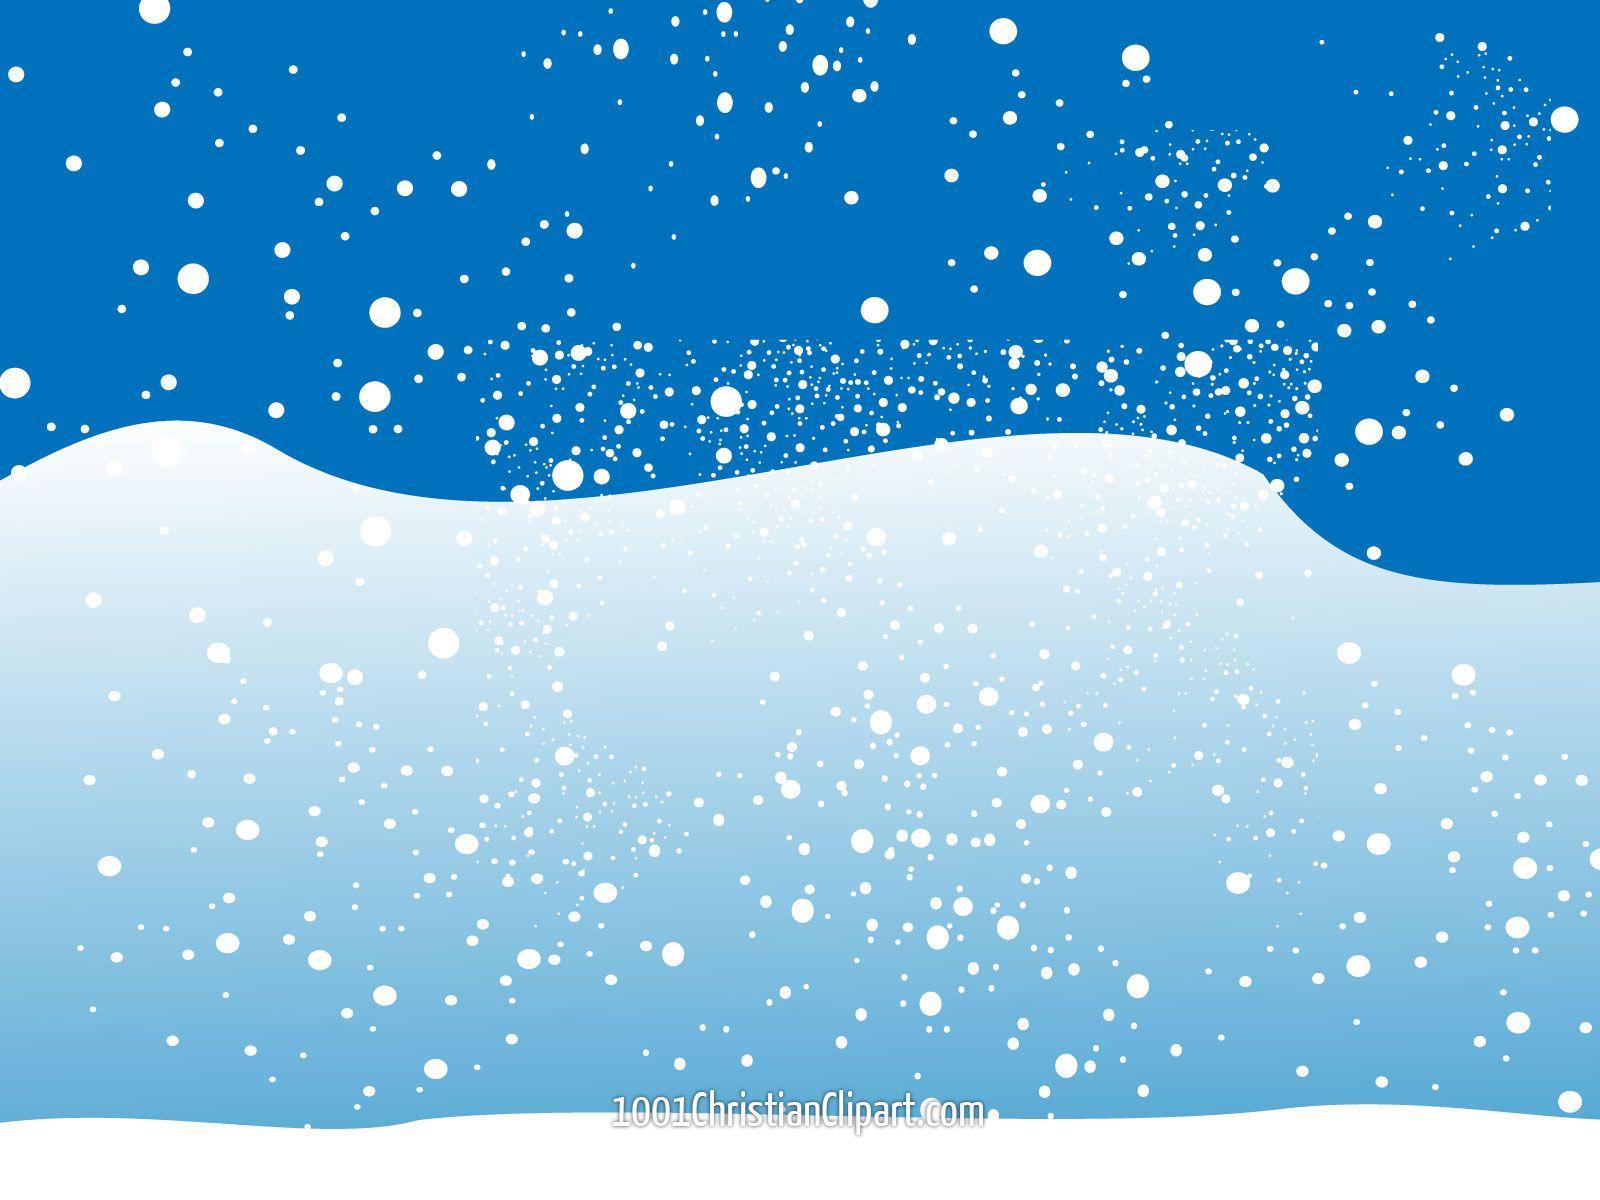 Christmas Winter Snow Scene Clip Art   C-Christmas Winter Snow Scene Clip Art   Christmas Snow Free Clipart Free Clip  Art Images-3